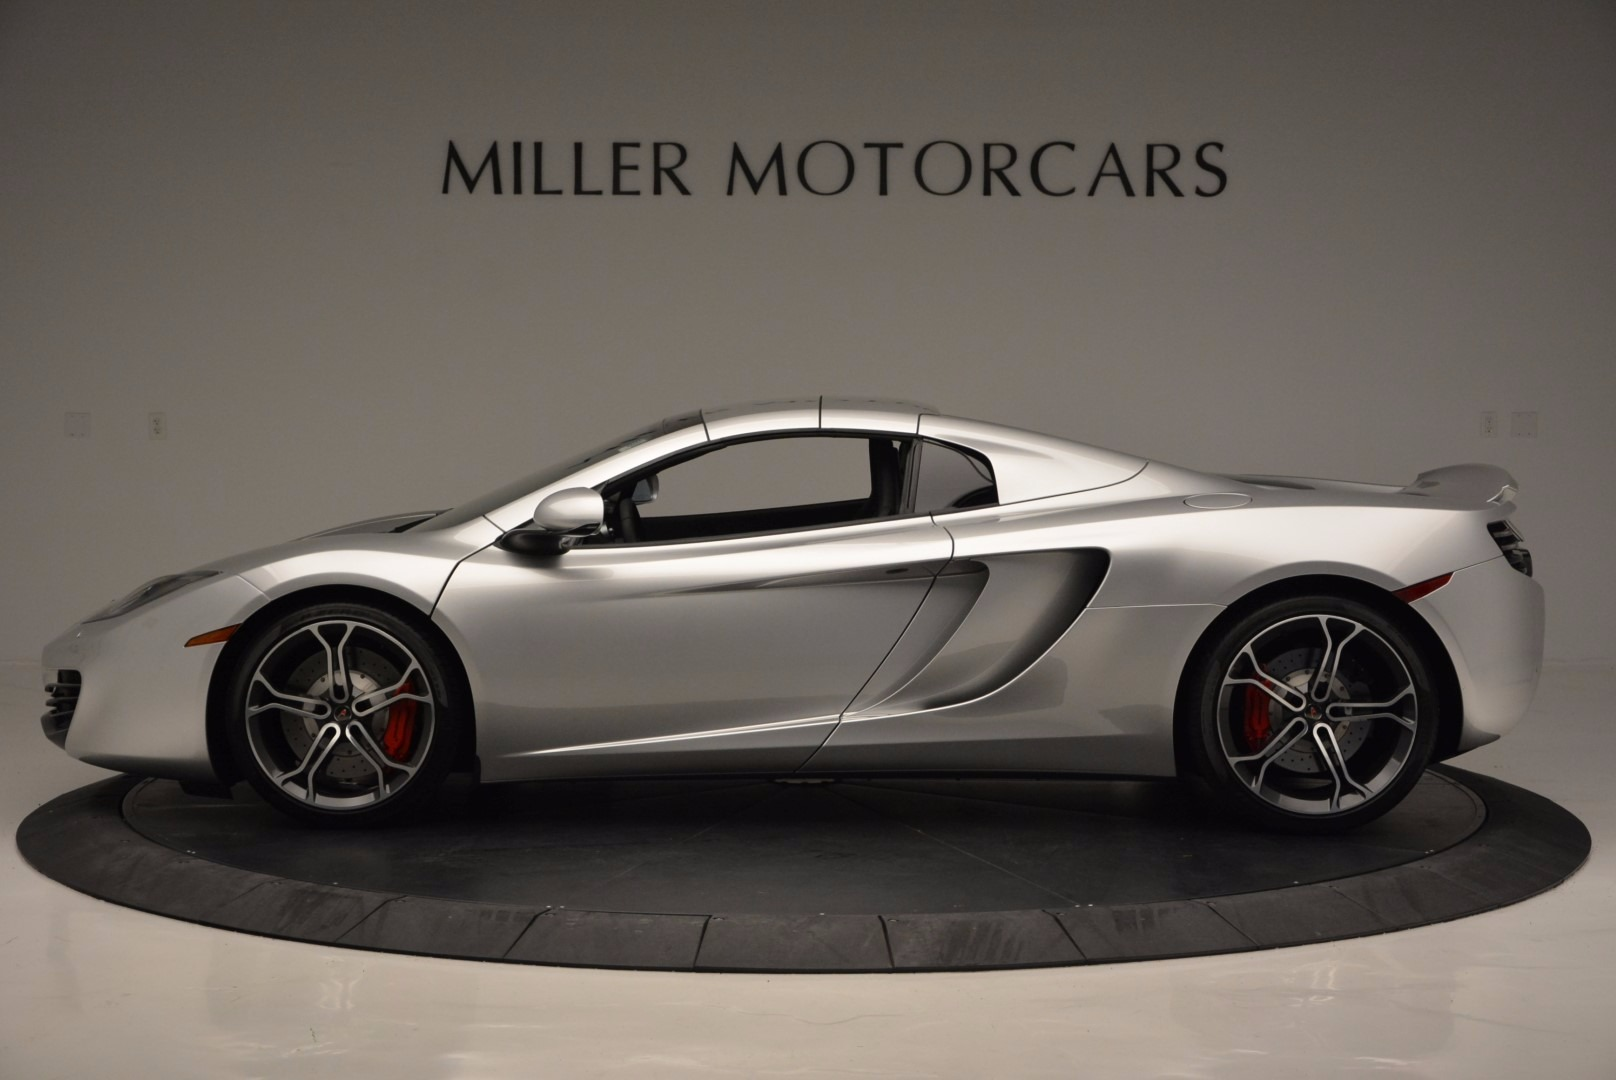 Used 2014 McLaren MP4-12C Spider  For Sale In Greenwich, CT. Alfa Romeo of Greenwich, 3089 627_p16